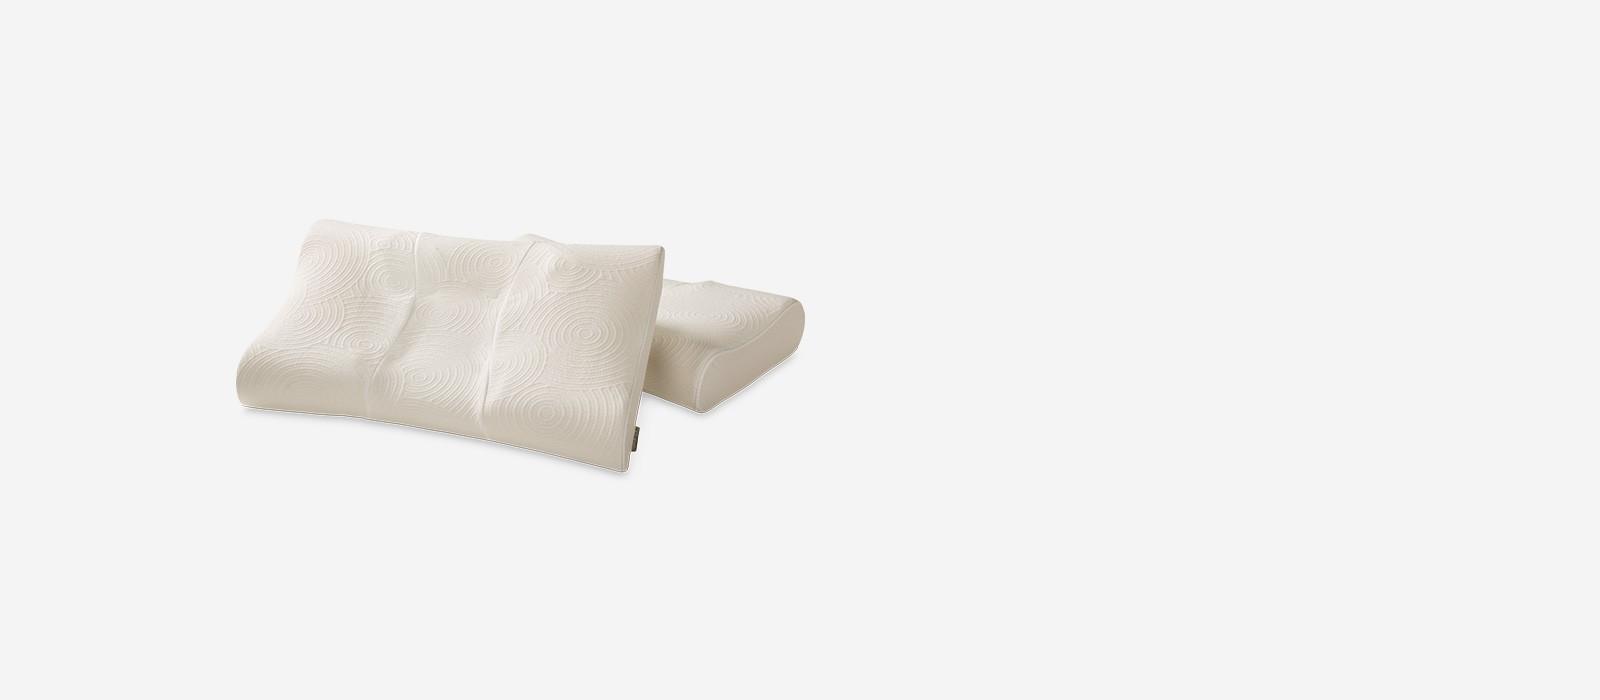 Tempur Protect Pillow Protector Tempur Pedic